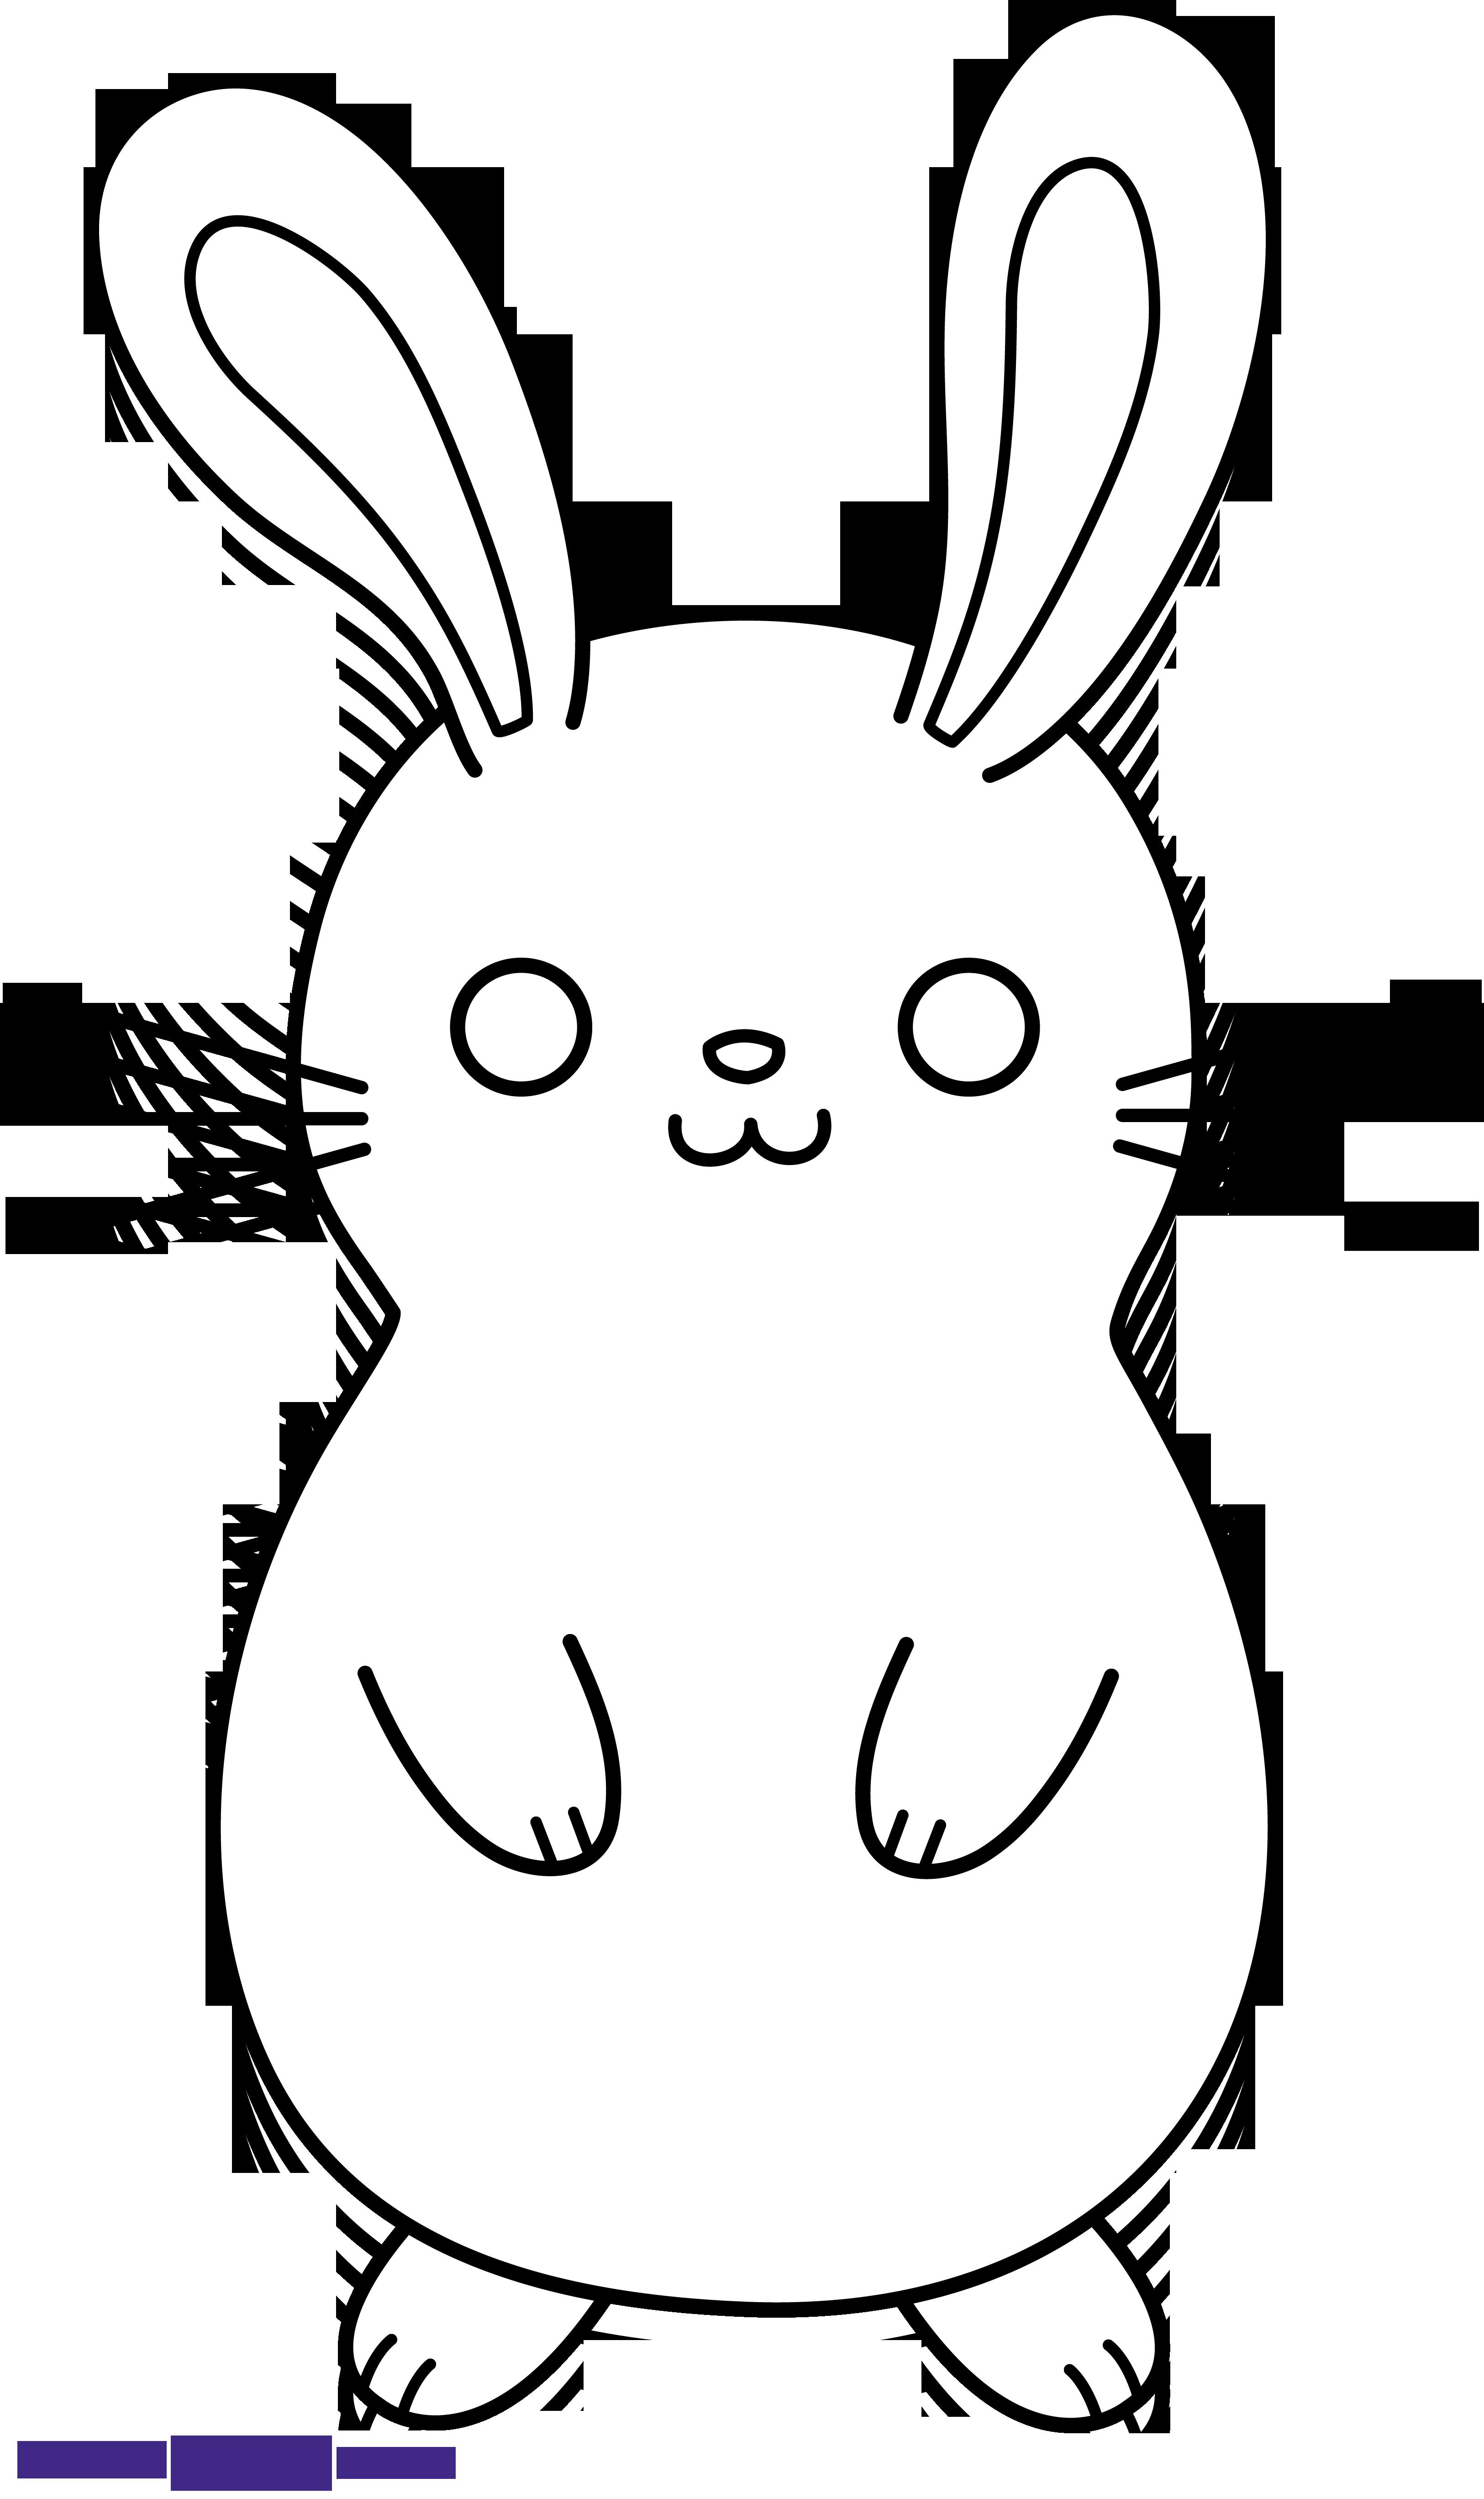 Clipart bunny rabbit. Cute lineart black white